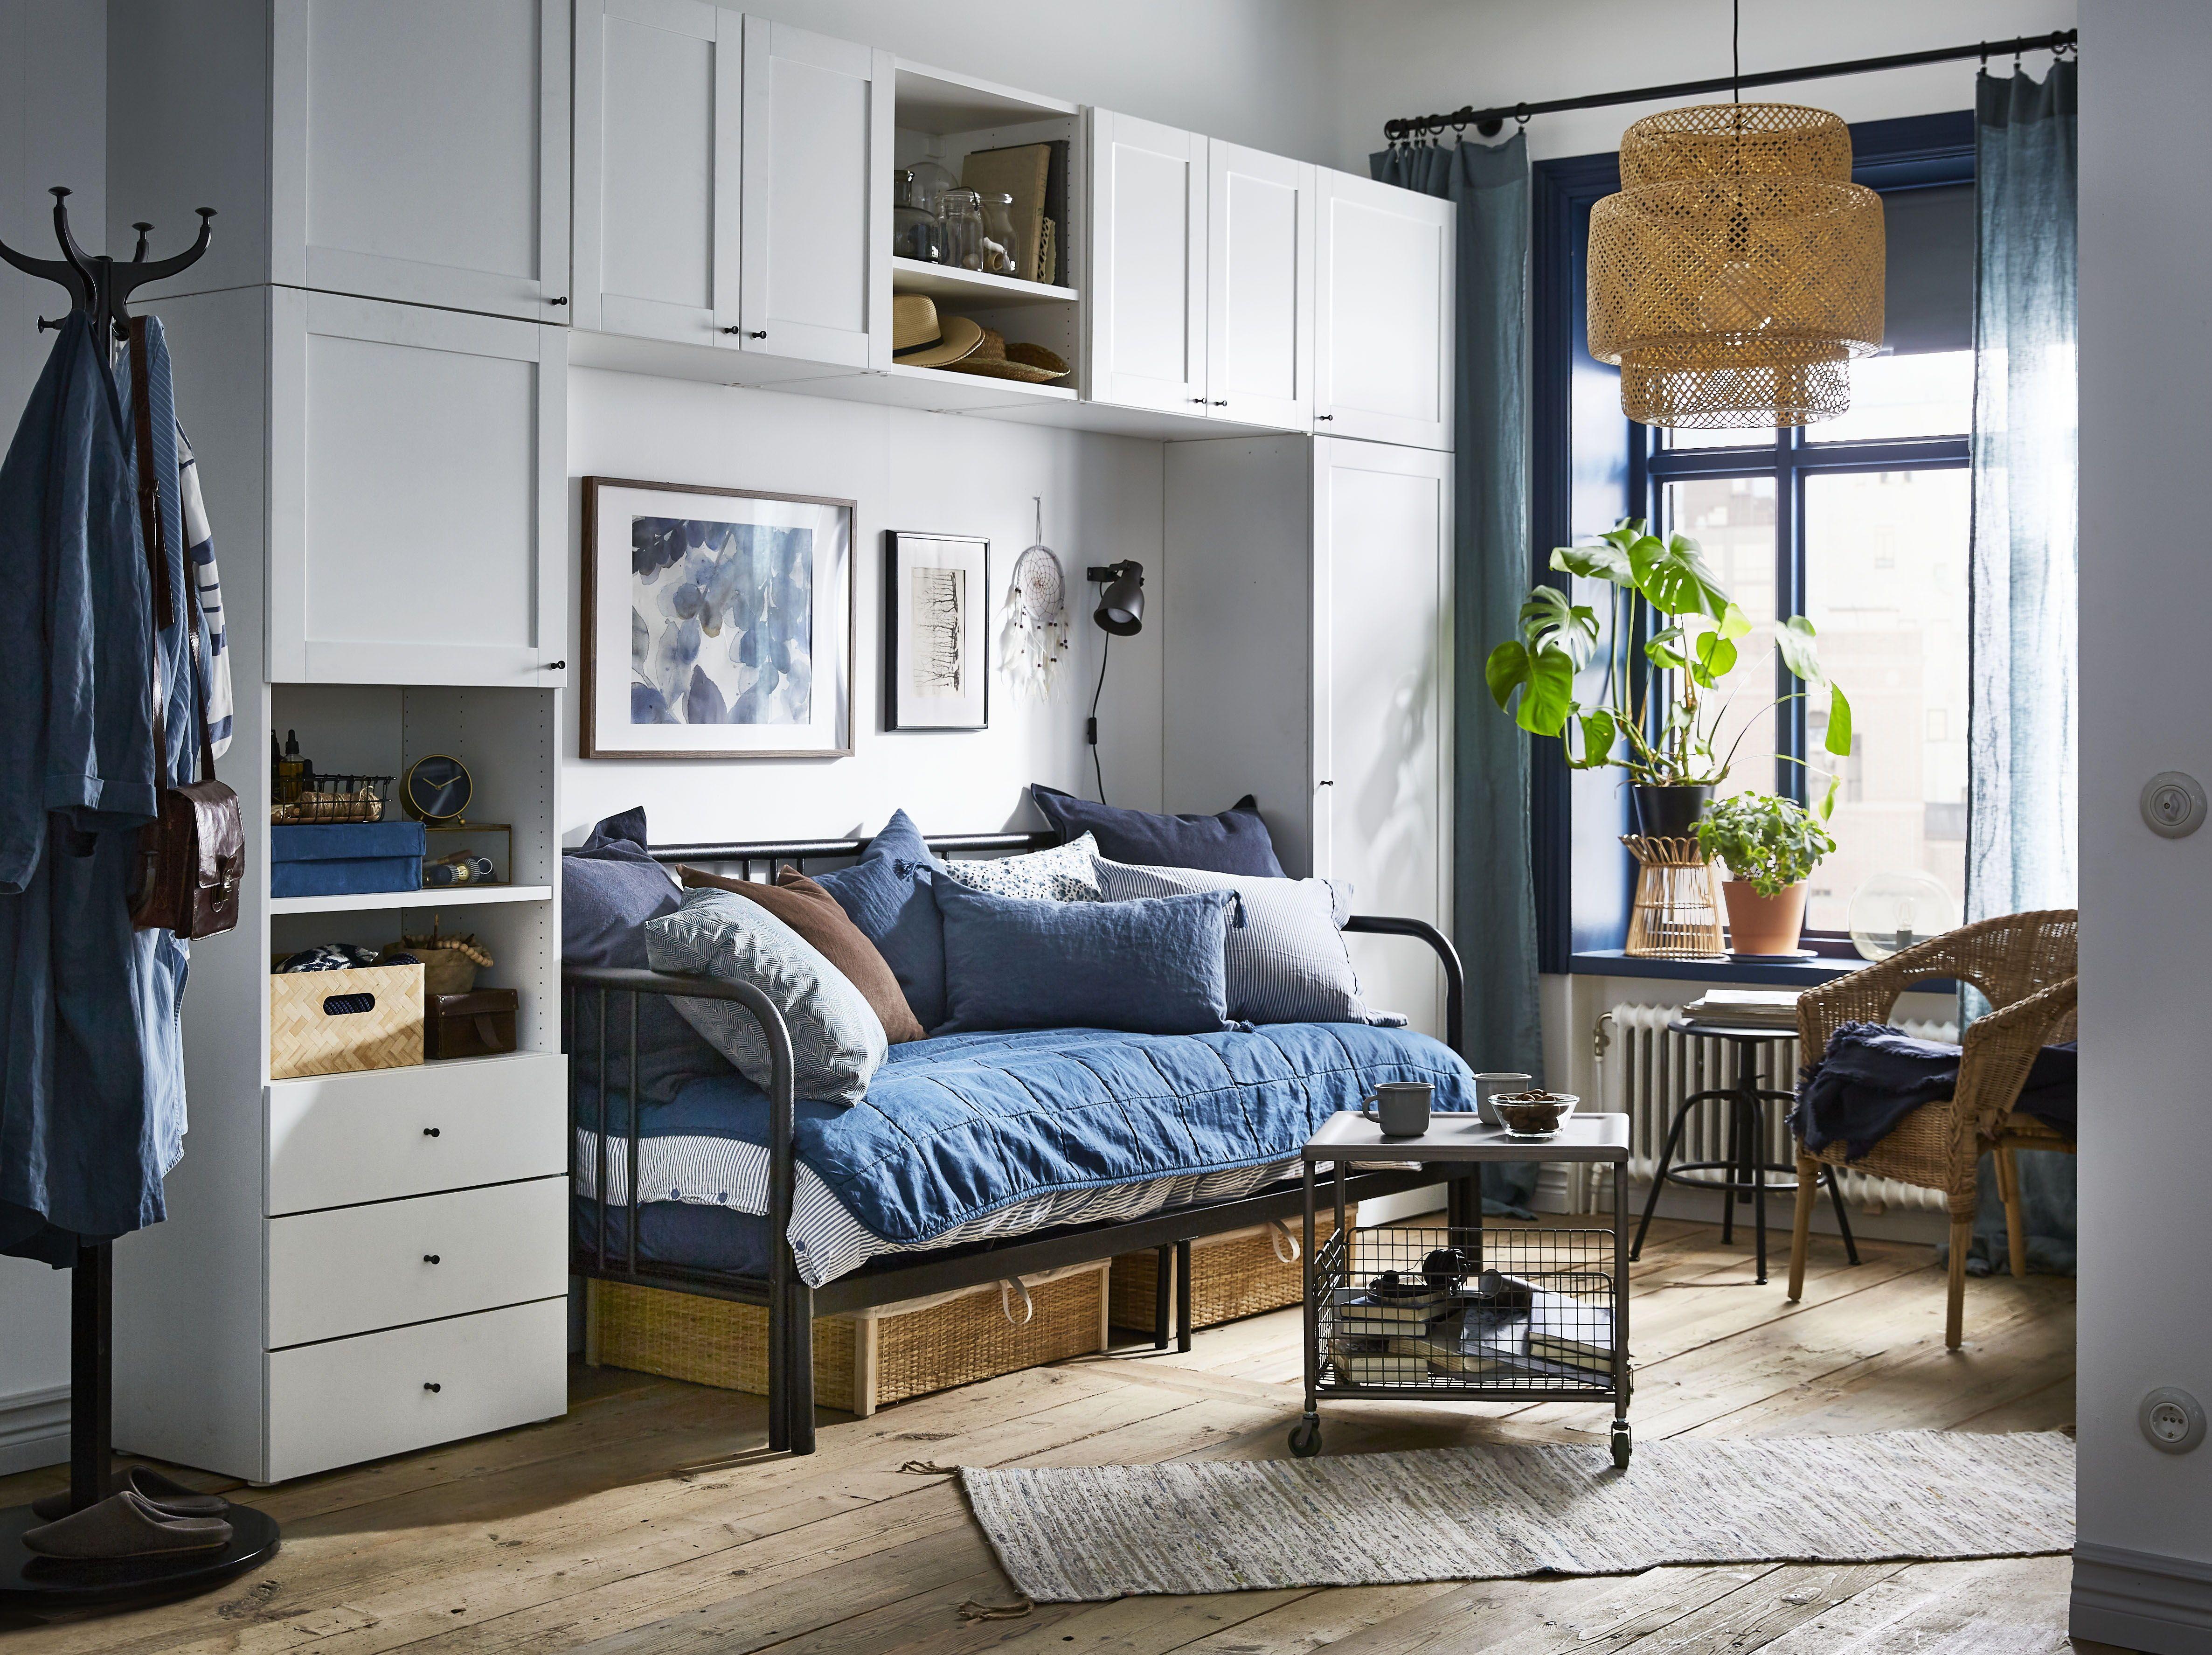 Platsa Kledingkast Ikea Ikeanl Ikeanederland Inspiratie